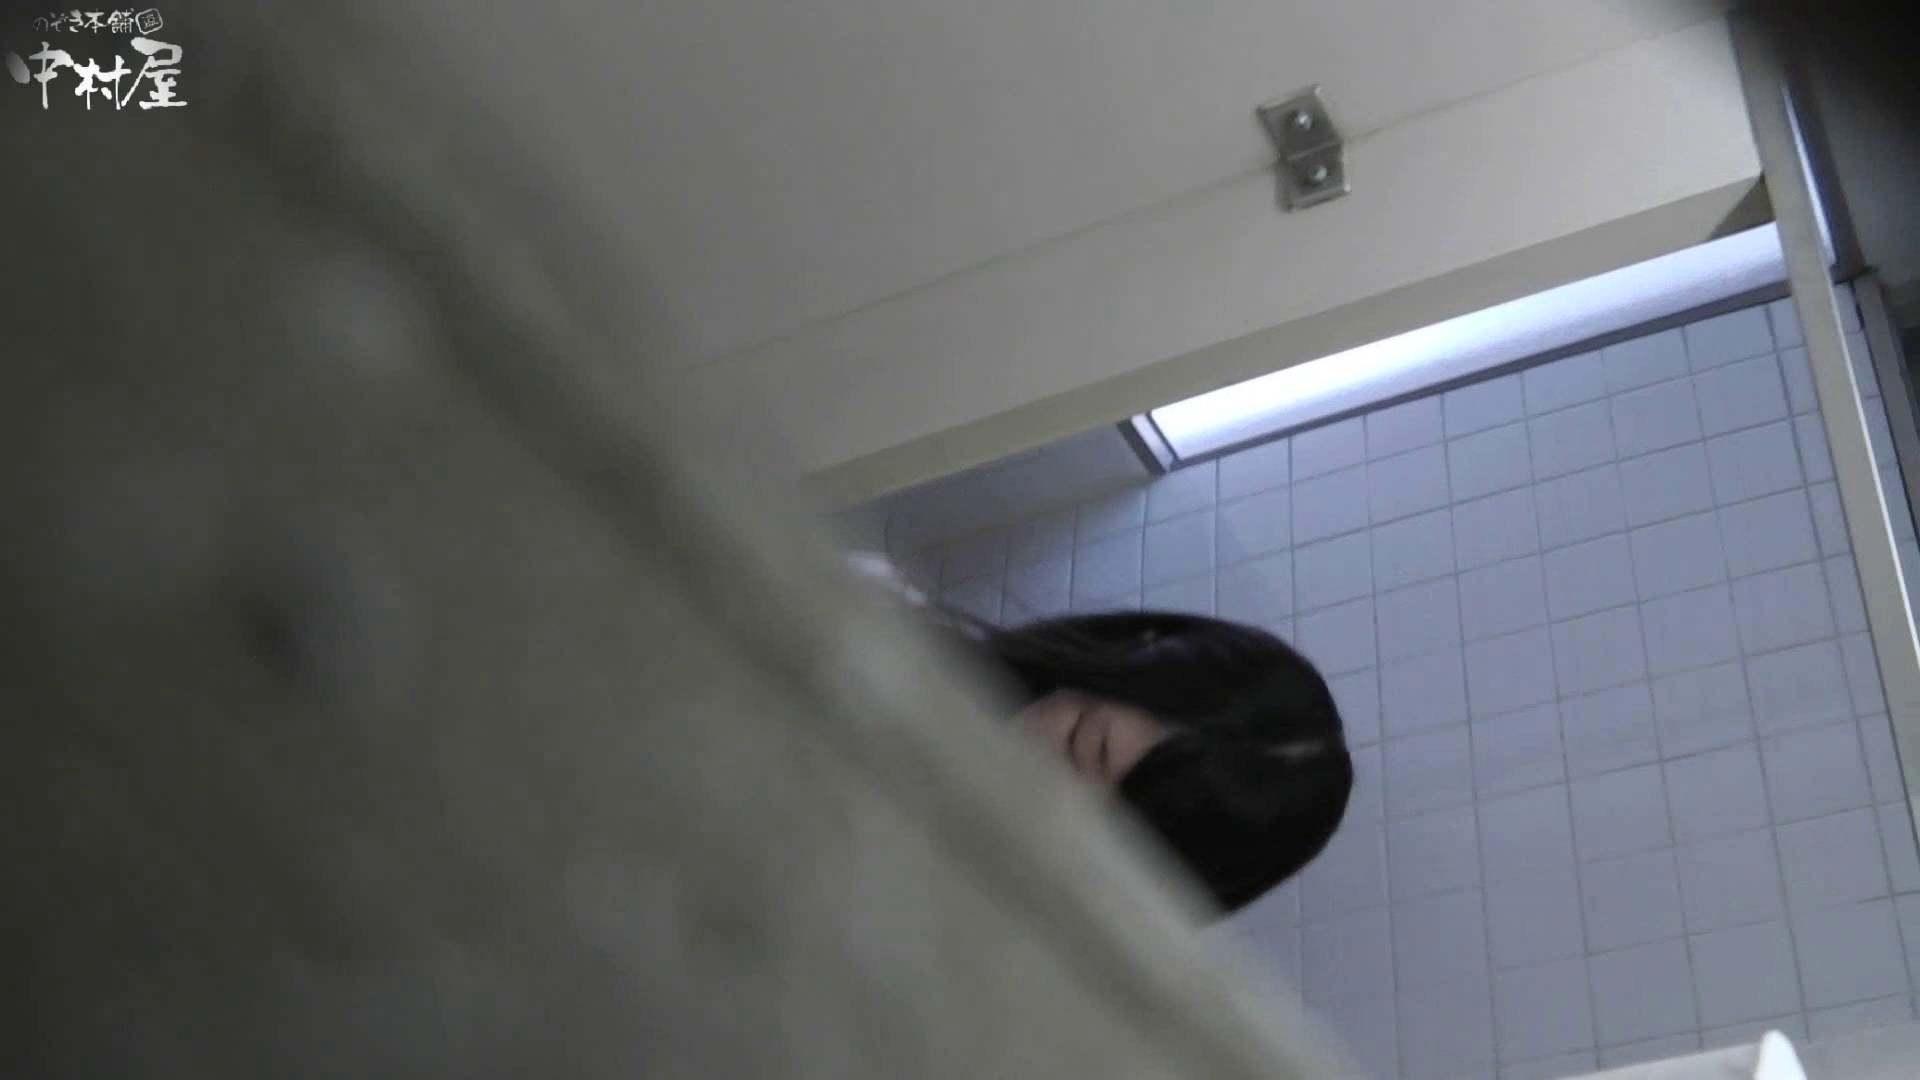 vol.06 命がけ潜伏洗面所! 茶髪タン、ハァハァ 後編 潜入突撃  82pic 56